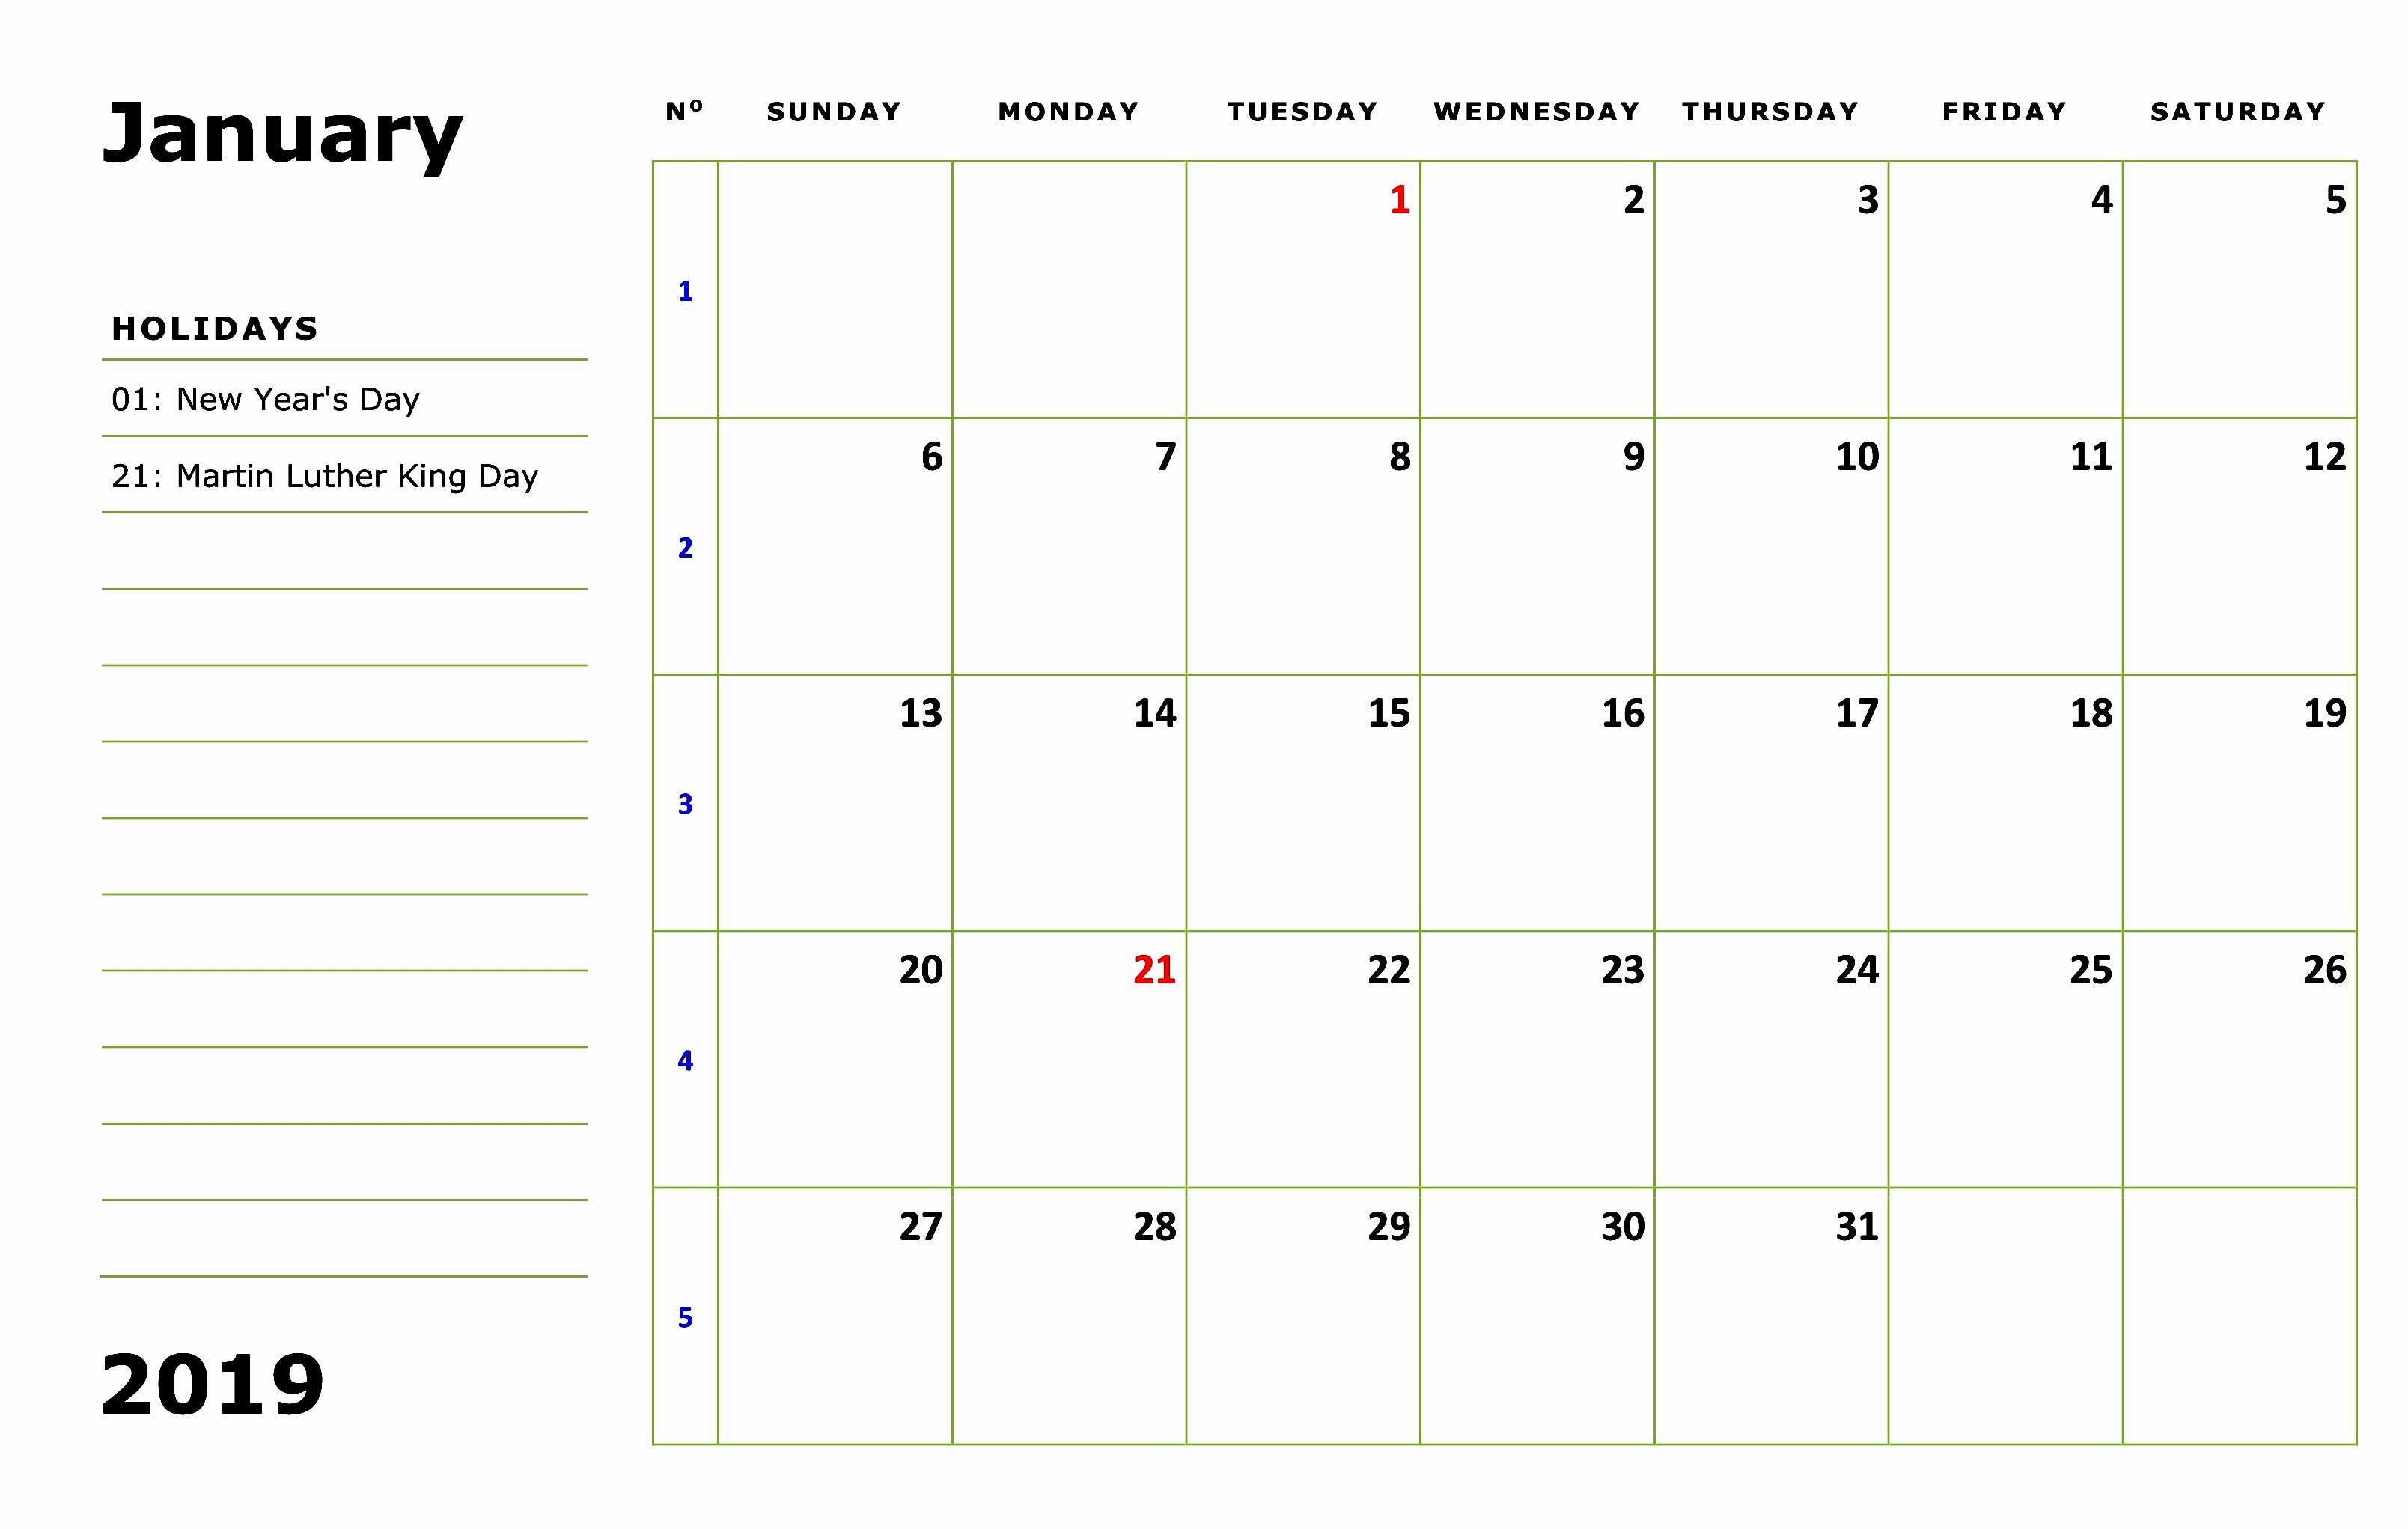 January 2019 Calendar Editable Template January 2019 Calendar